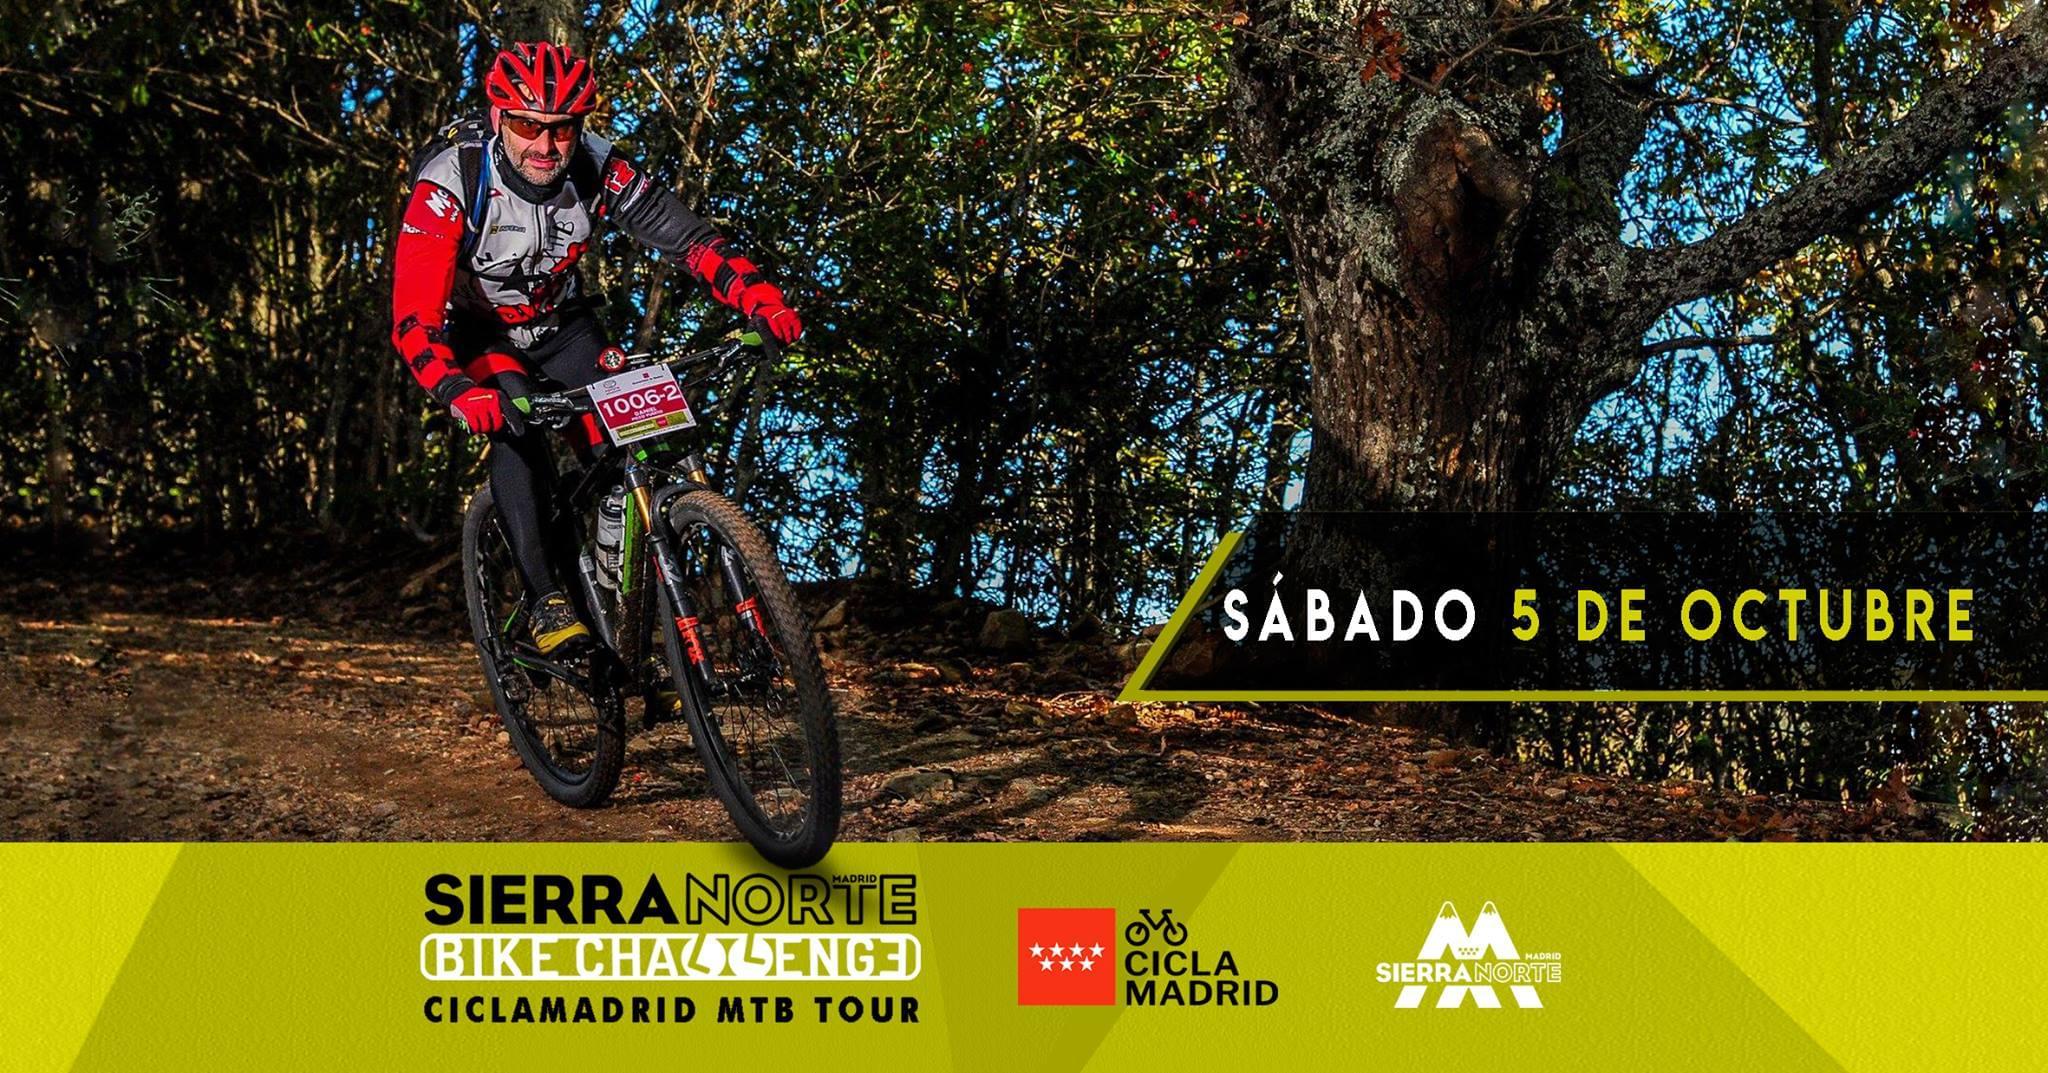 Lozoya Acoge Este 5 De Octubre La Iv Sierra Norte Bike Challenge Ciclamadrid Mtb Tour